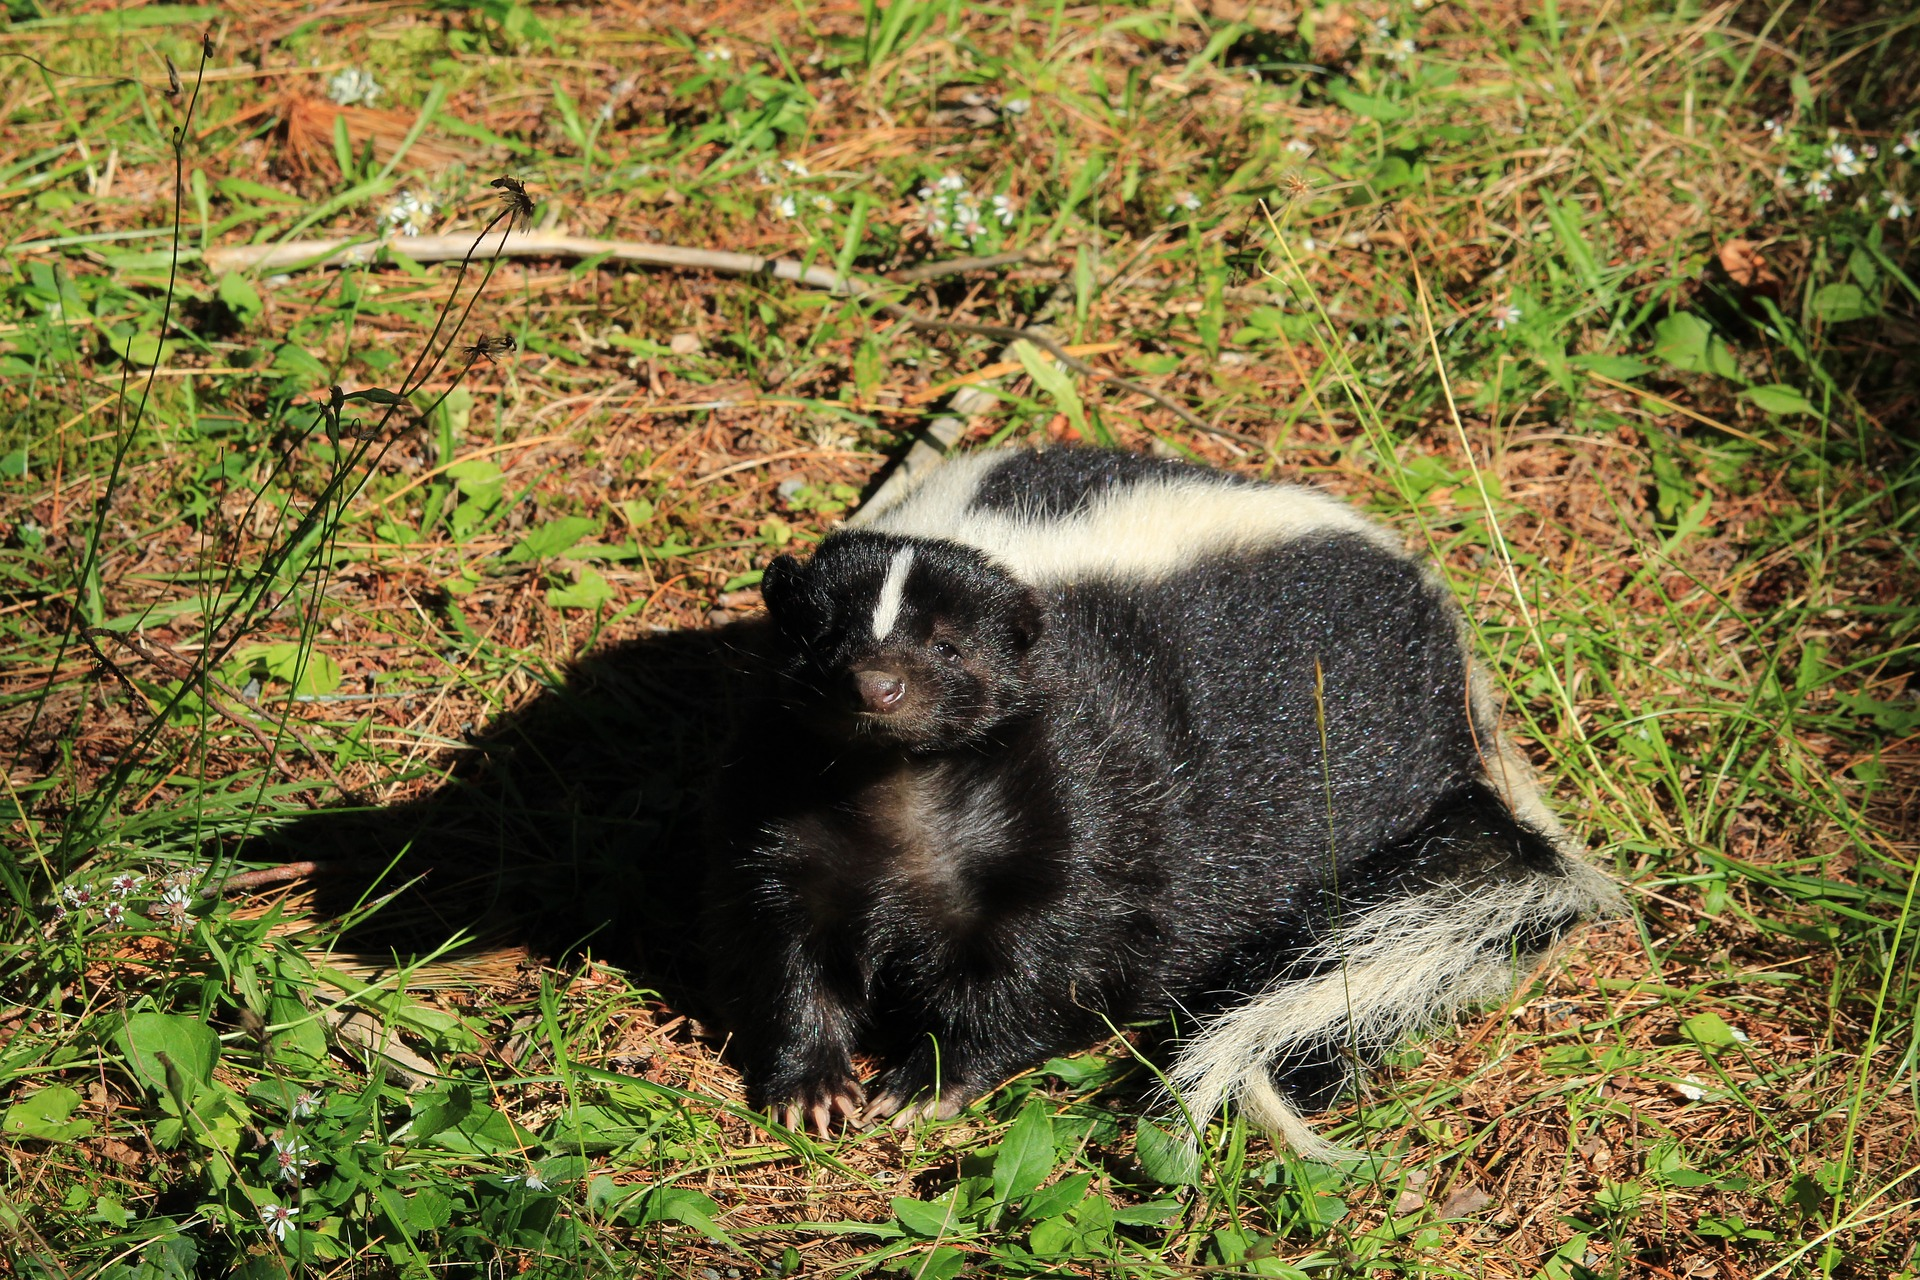 Photograph of skunk in backyard